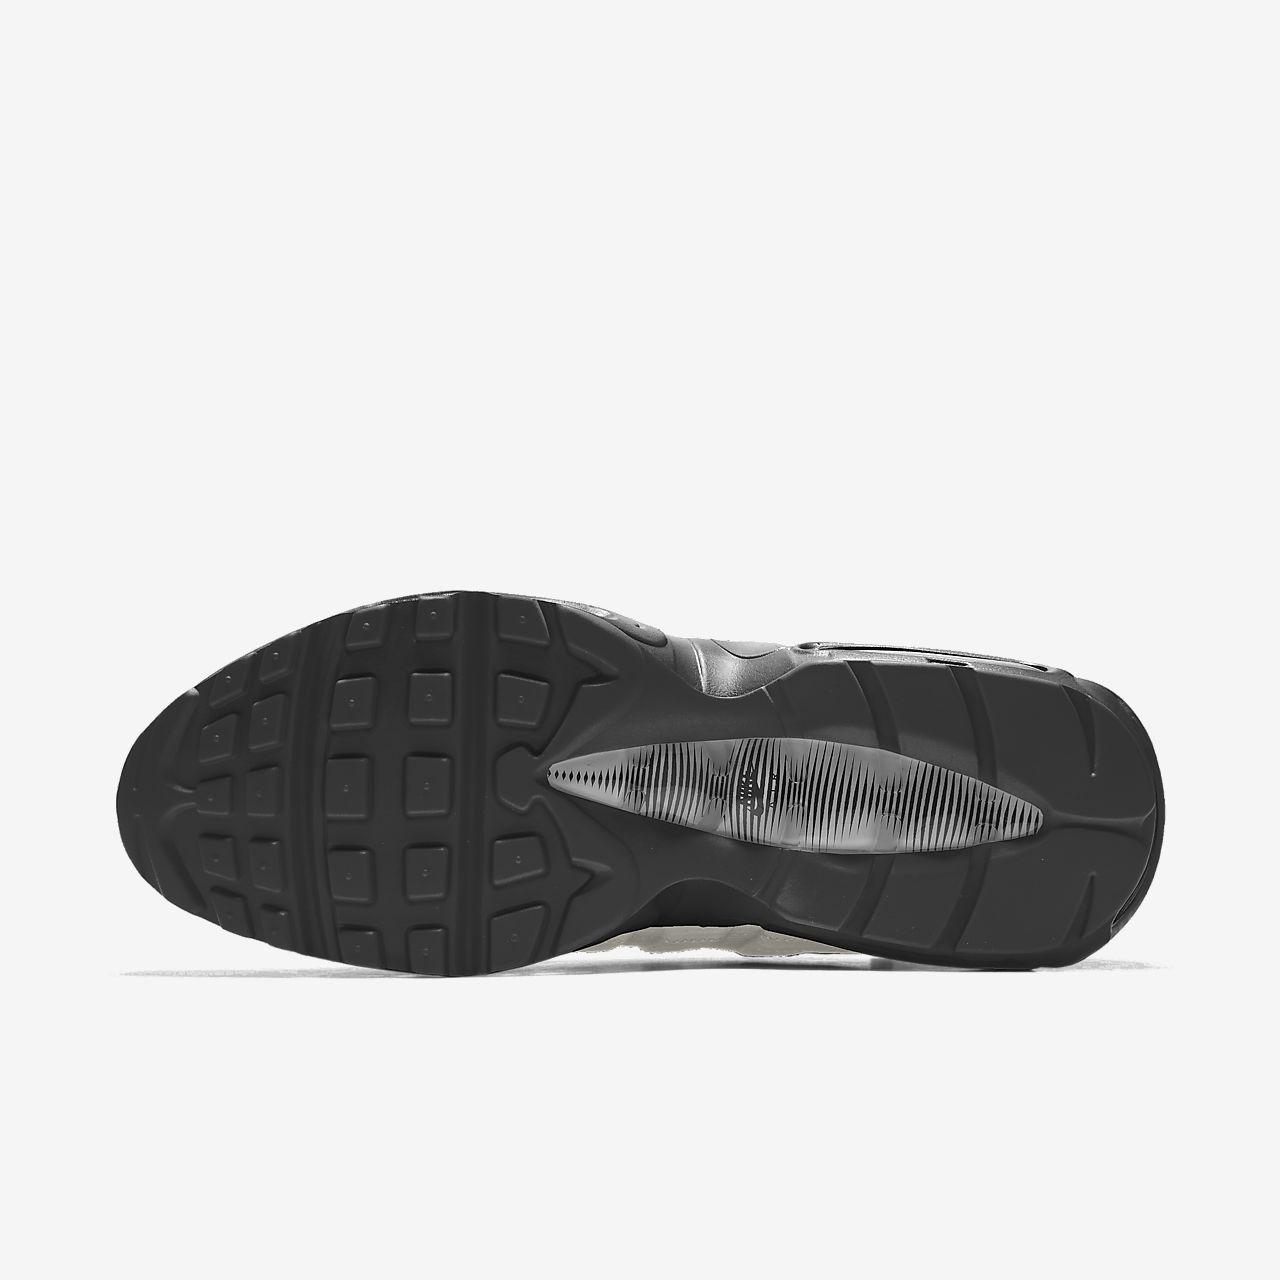 Nike Air Max 95 By You personalisierbarer Damenschuh